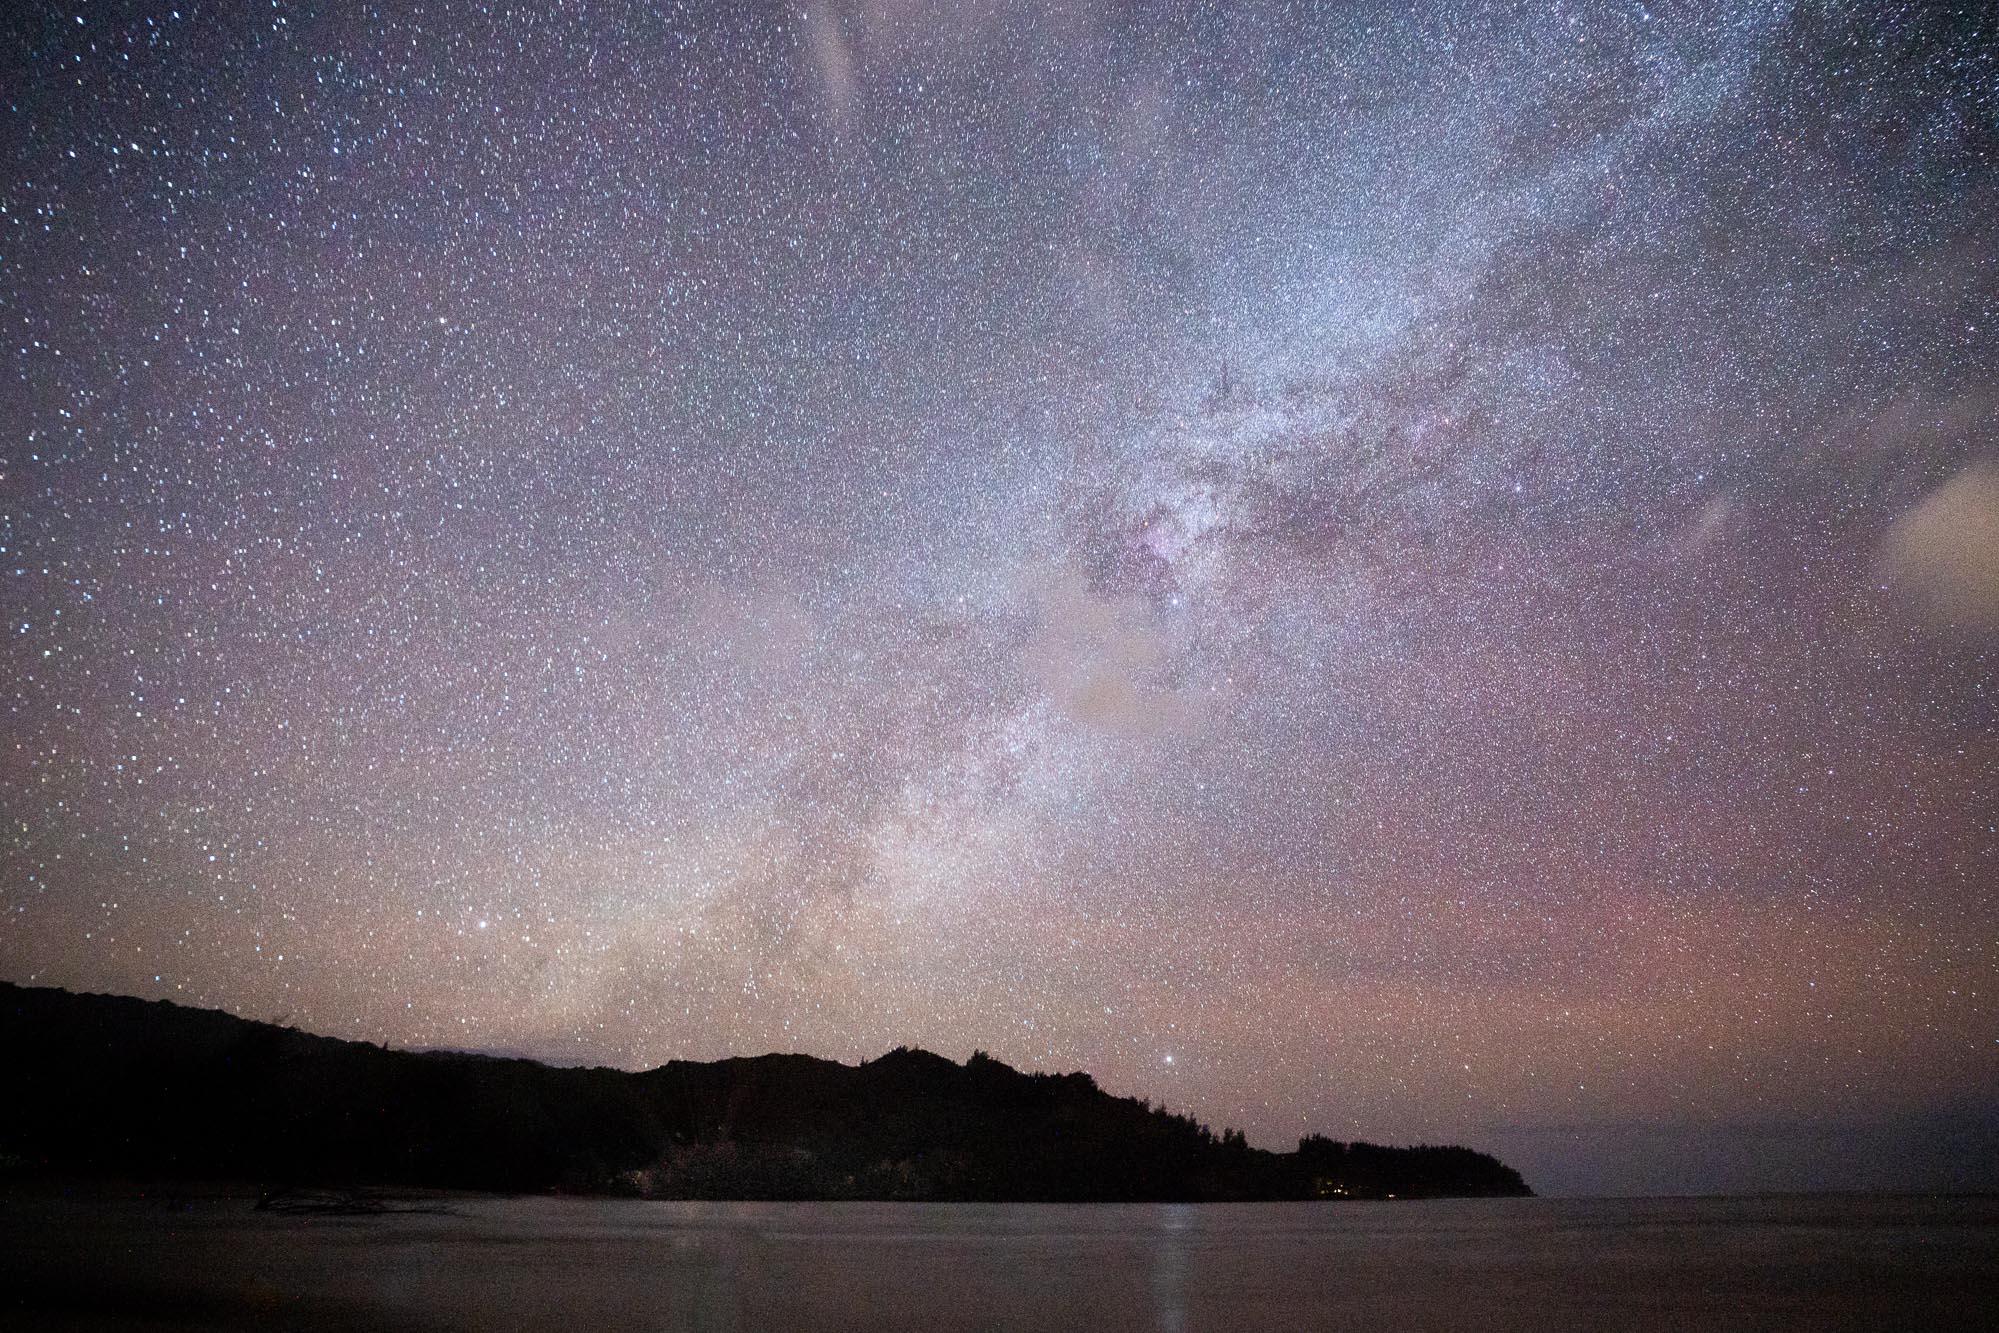 Kauai stars over Hanalei Bay at night via Find Us Lost